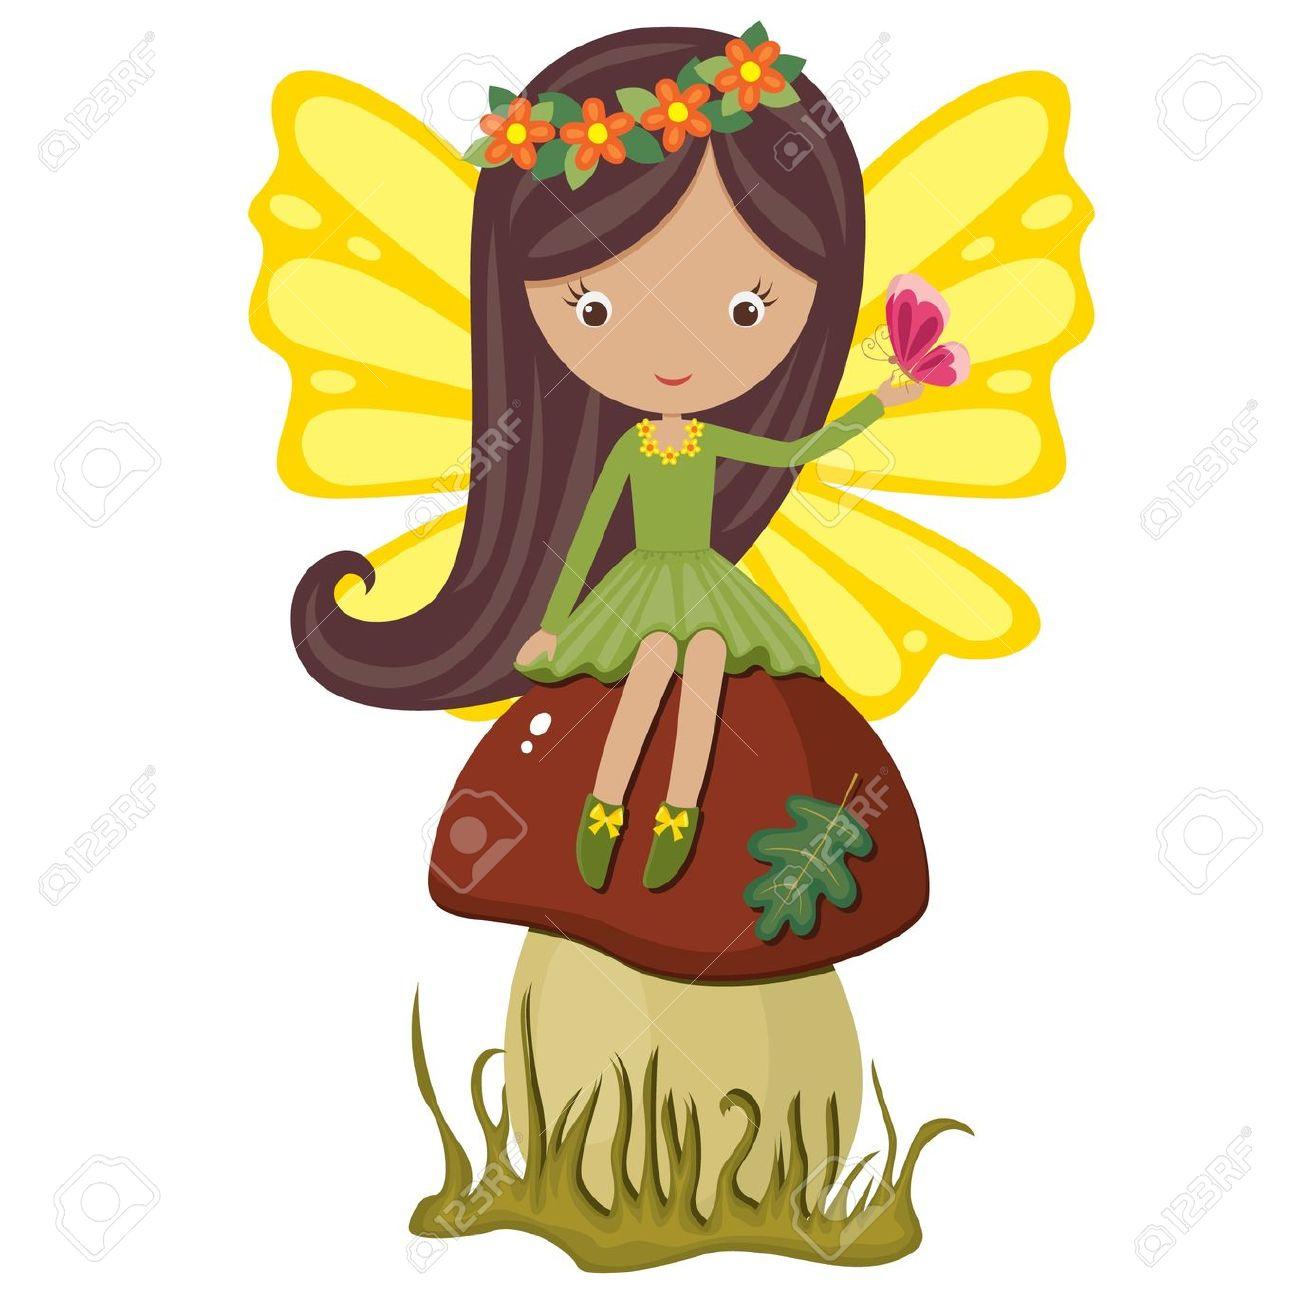 Elf clipart yellow #15 drawings Elf Fairy Elf